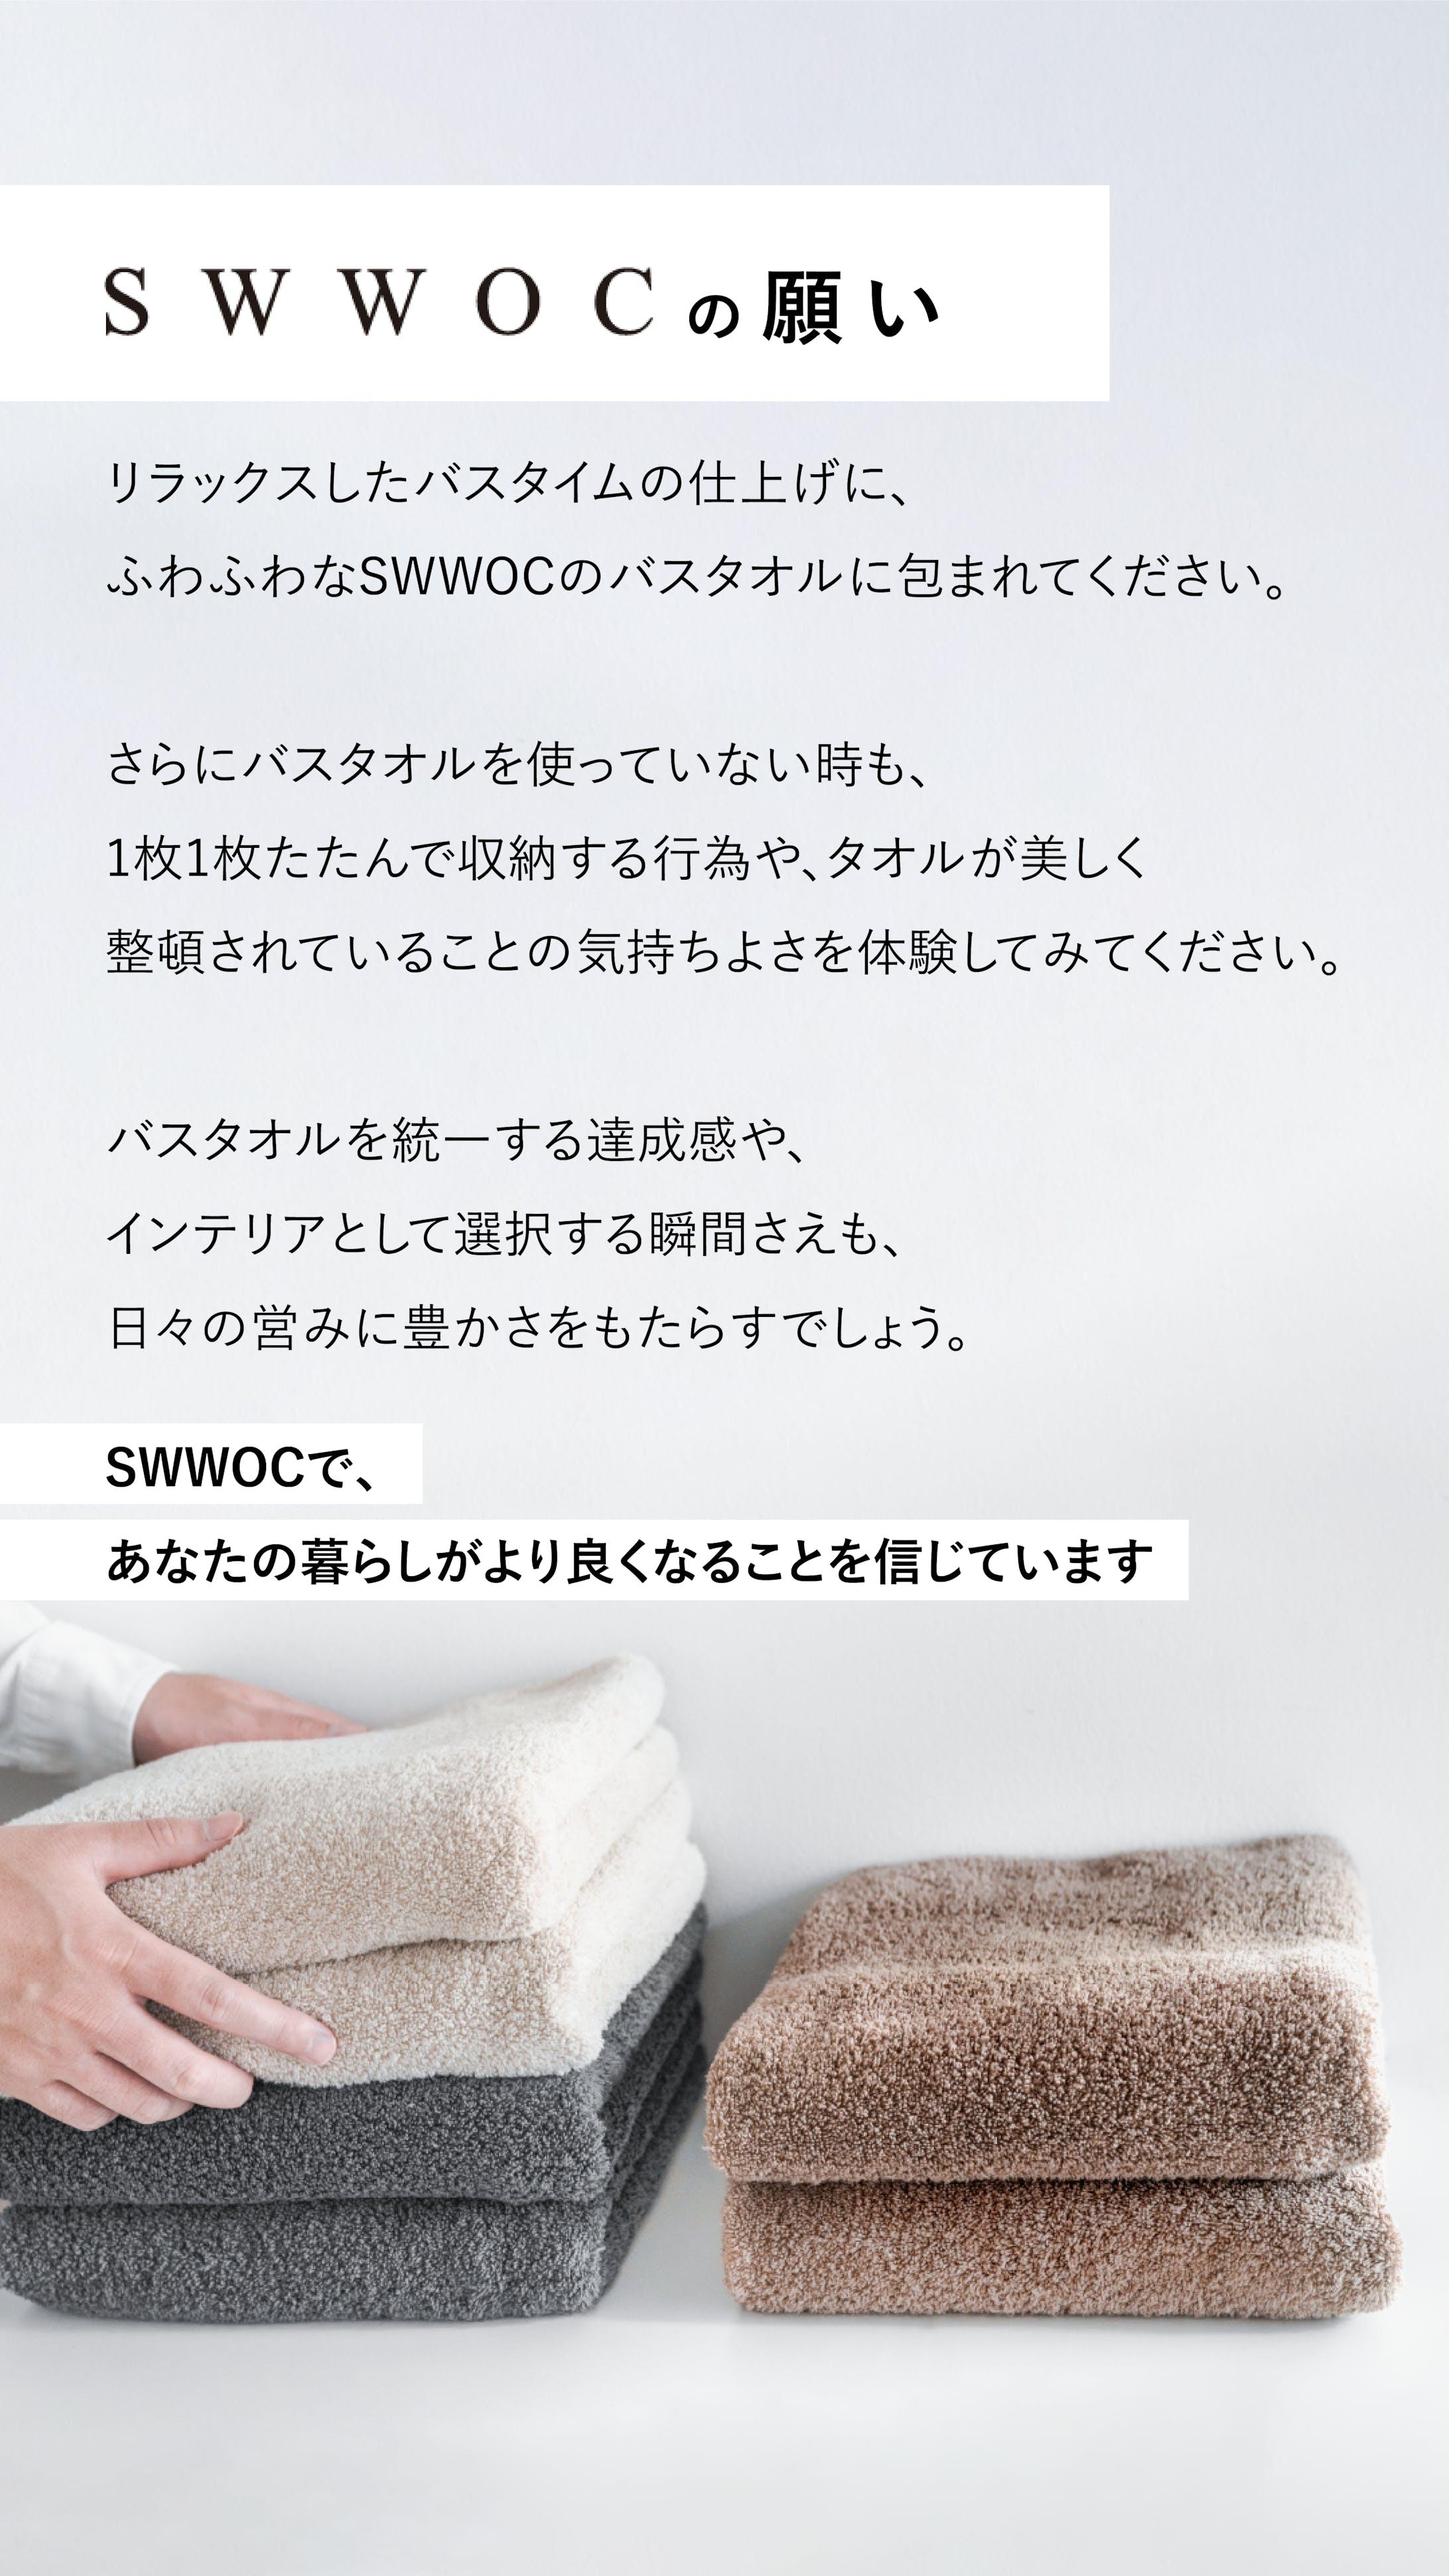 <SWWOC様> Instagramストーリー画像-4